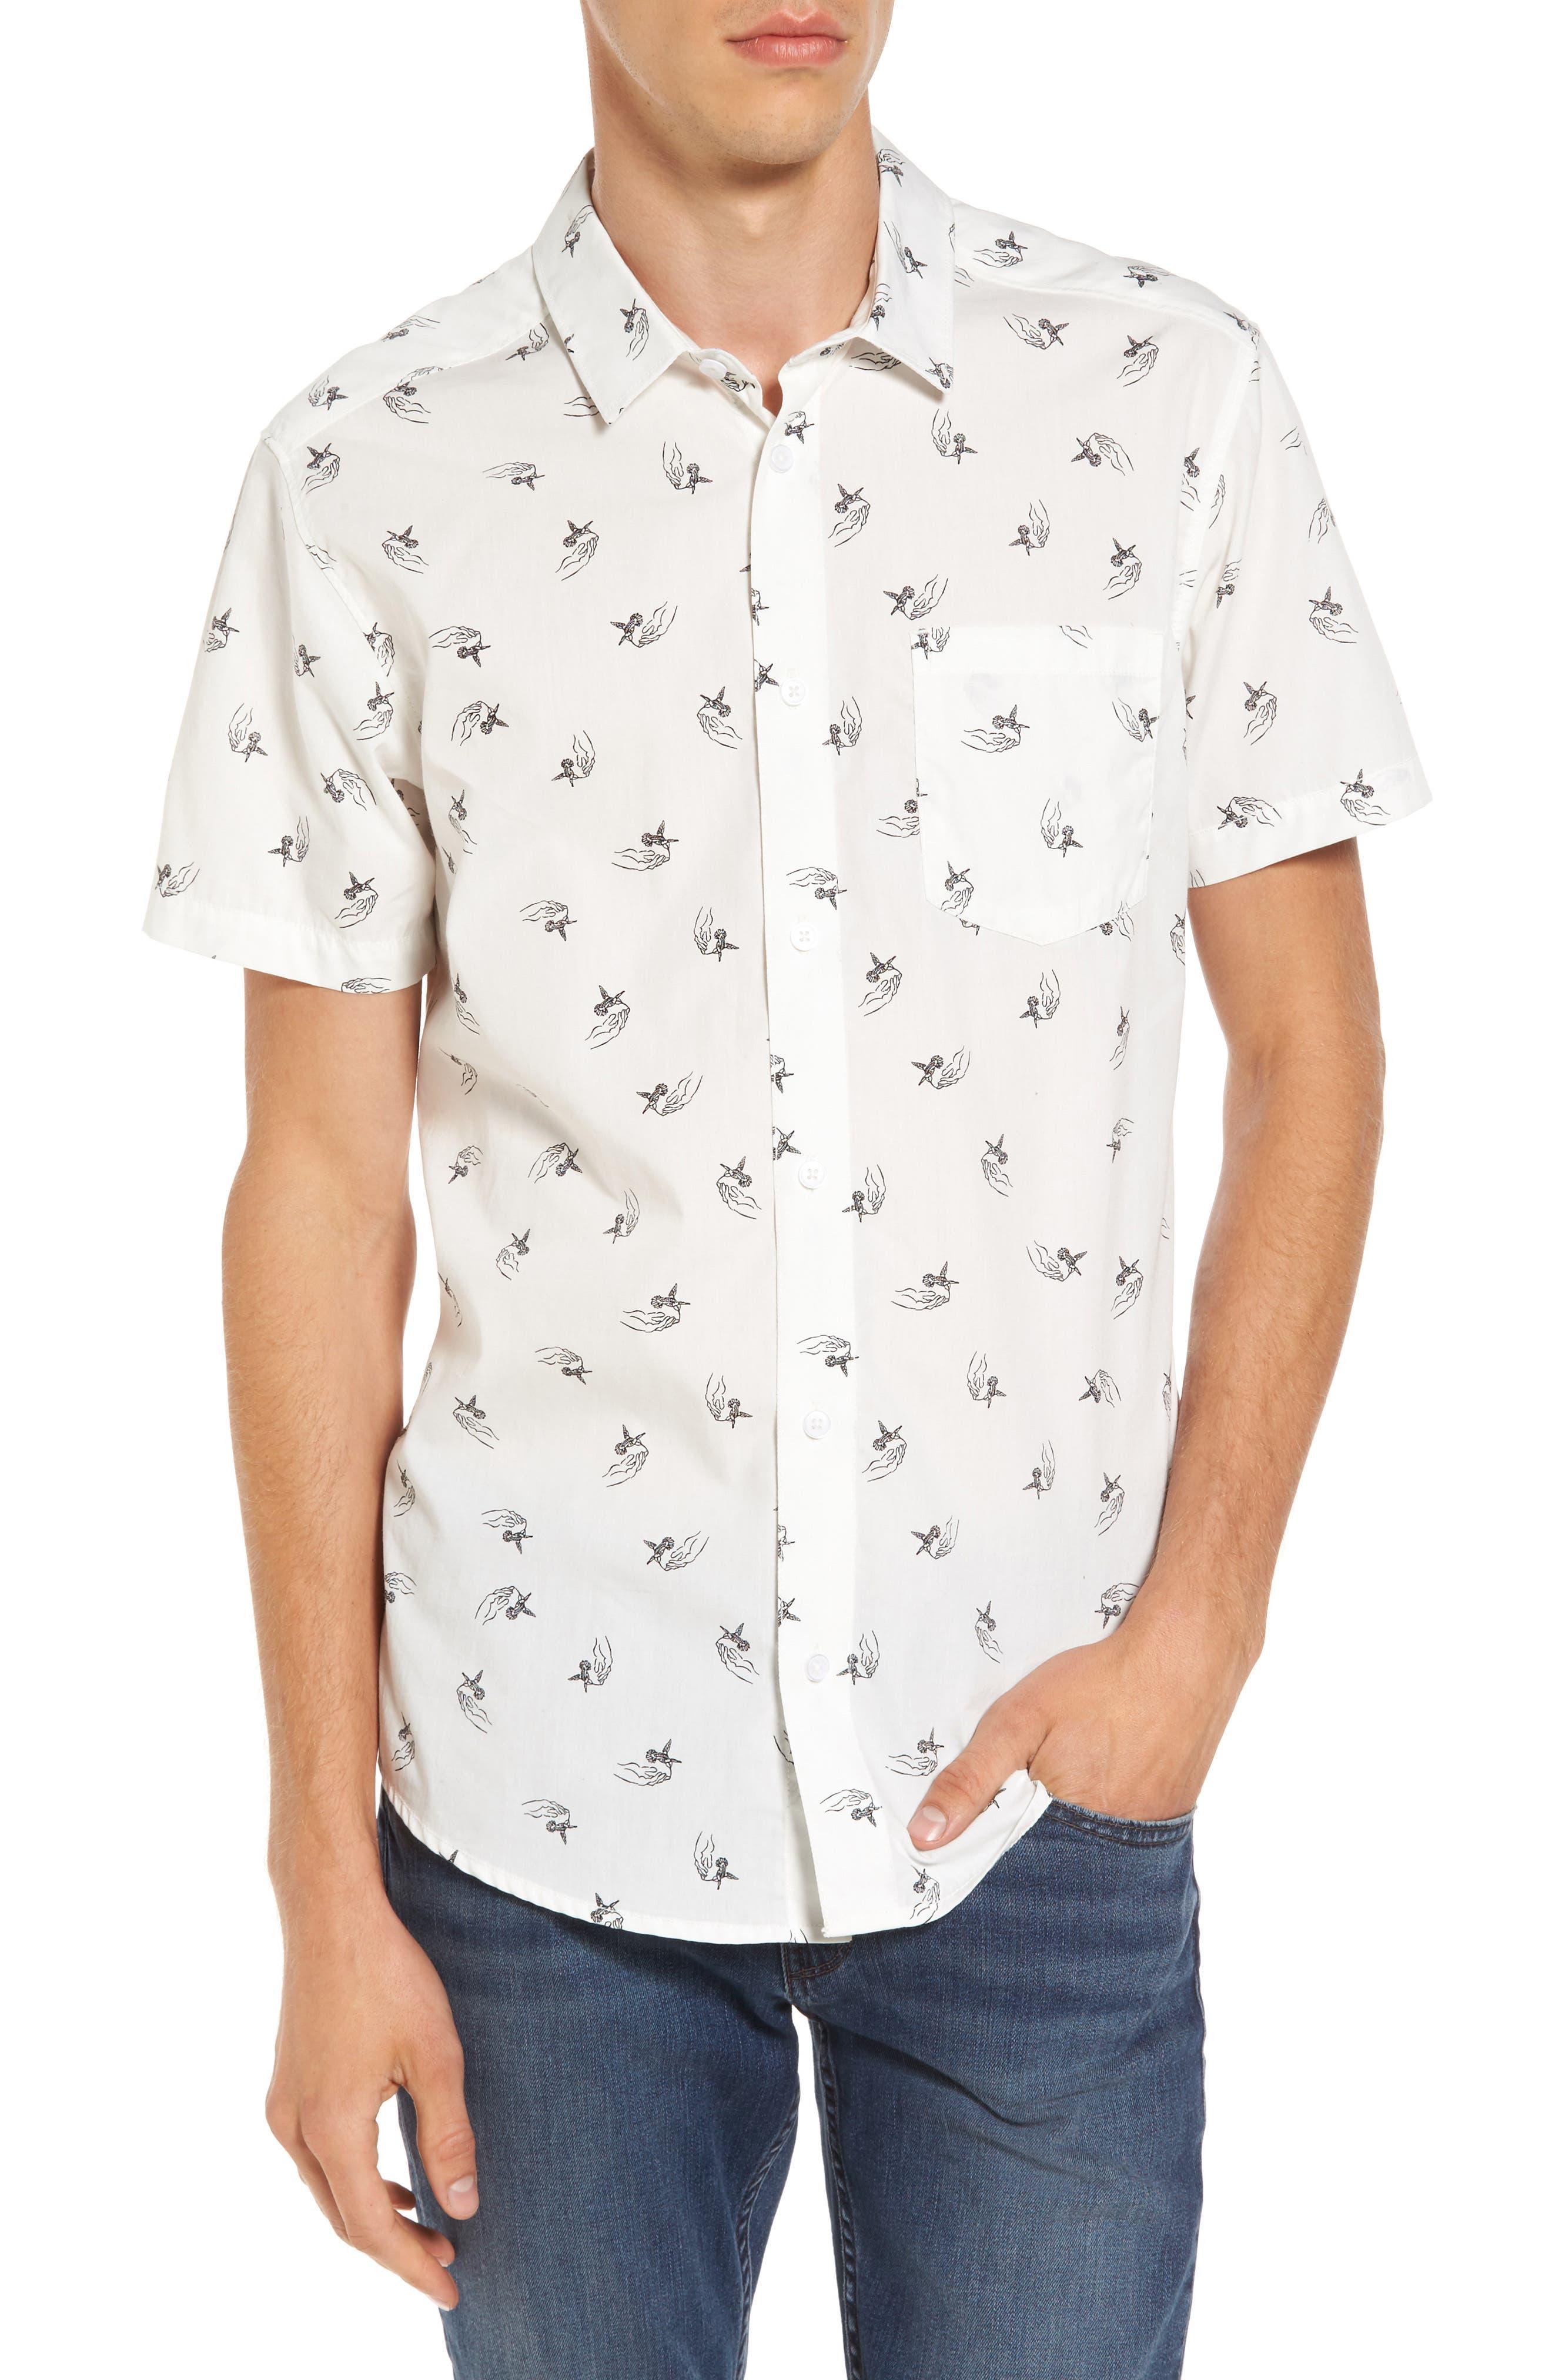 x Kevin Long Hummingbird Woven Shirt,                         Main,                         color, Antique White